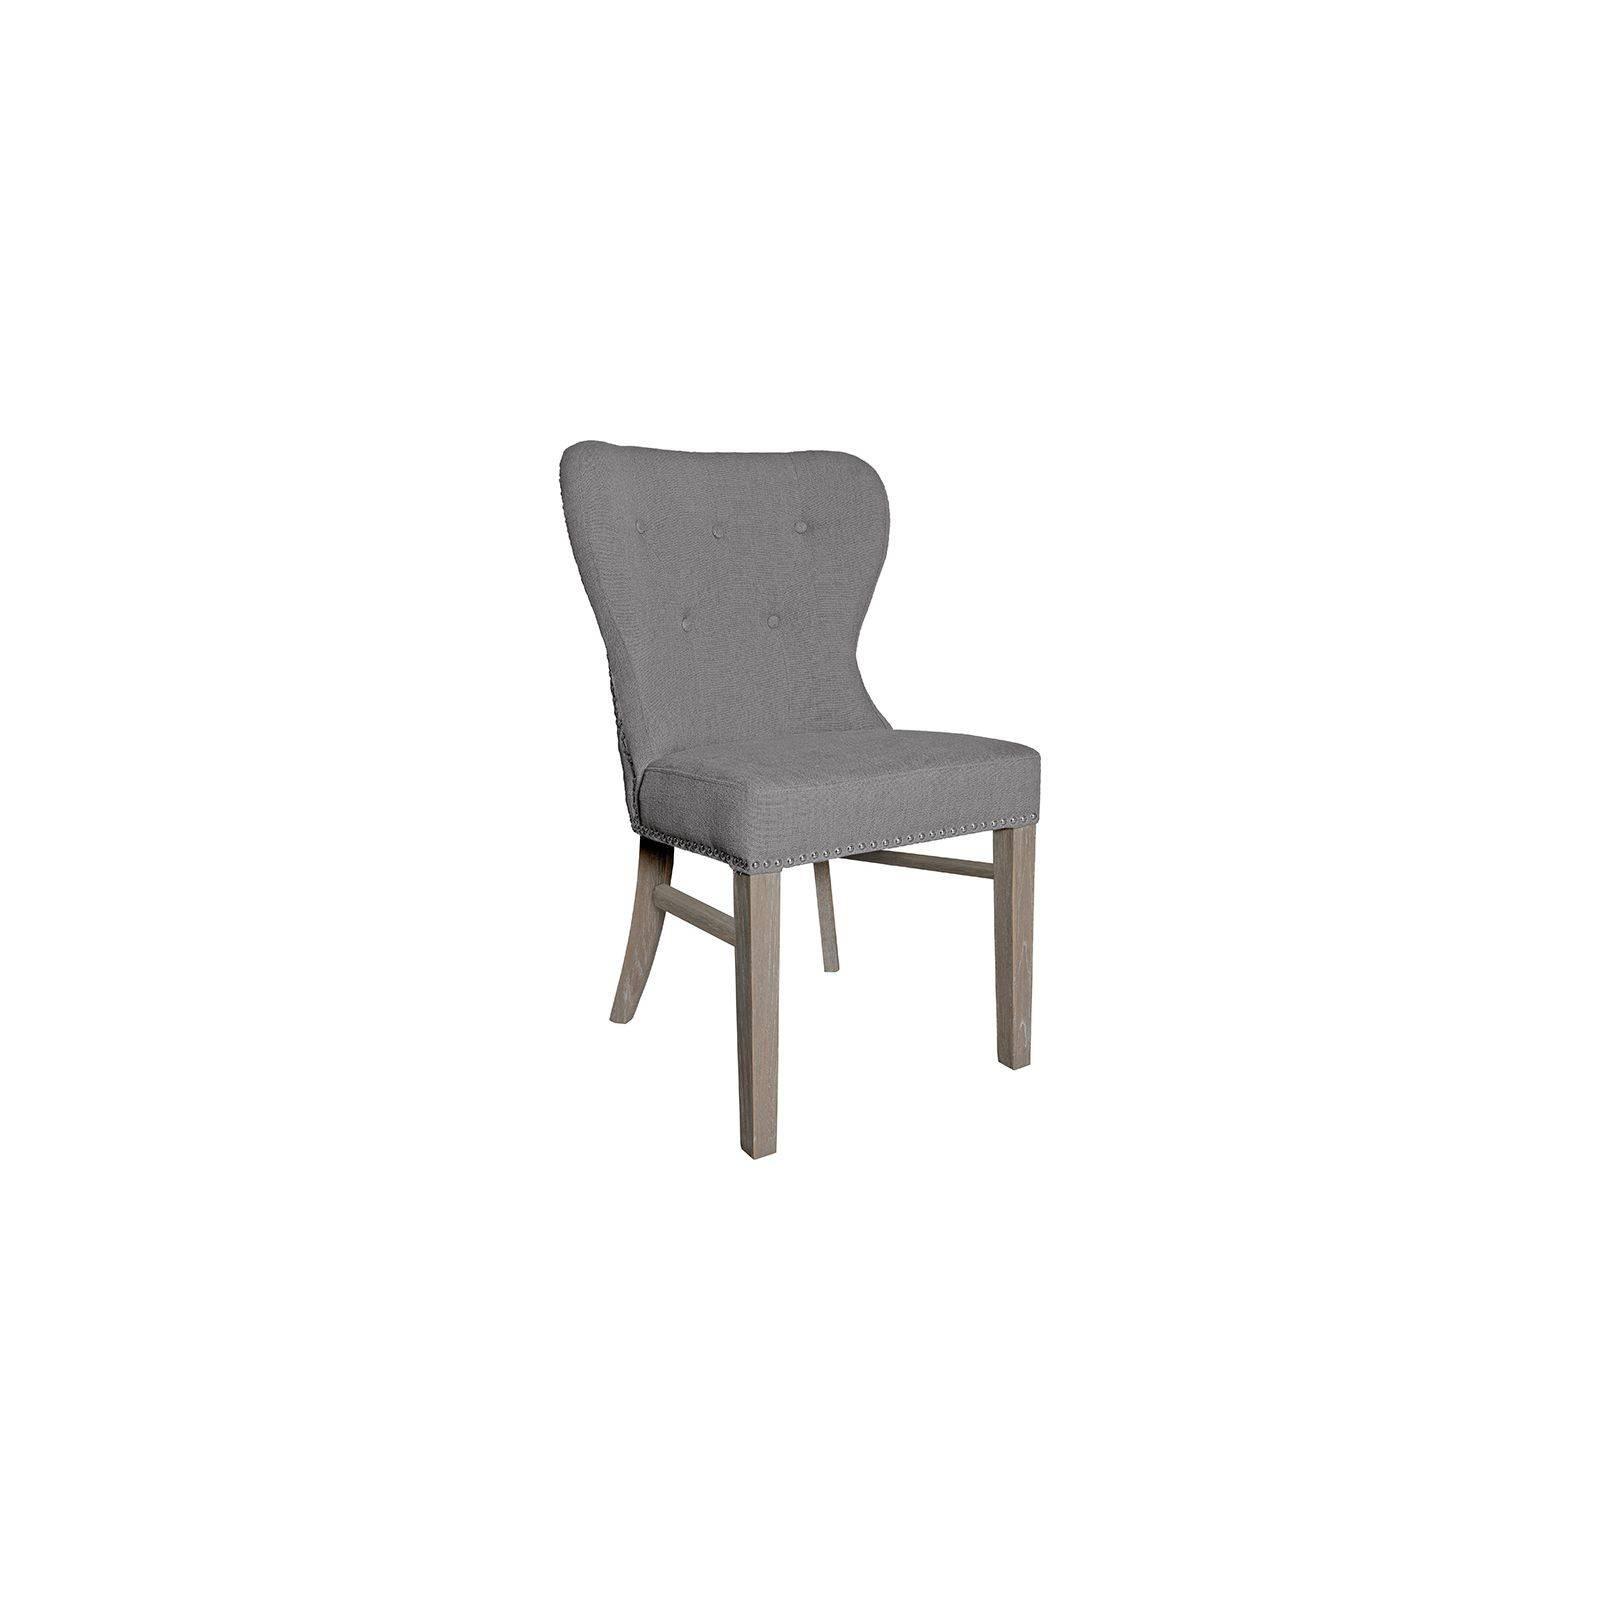 Chaise Genesis Tissu - Meuble style classique